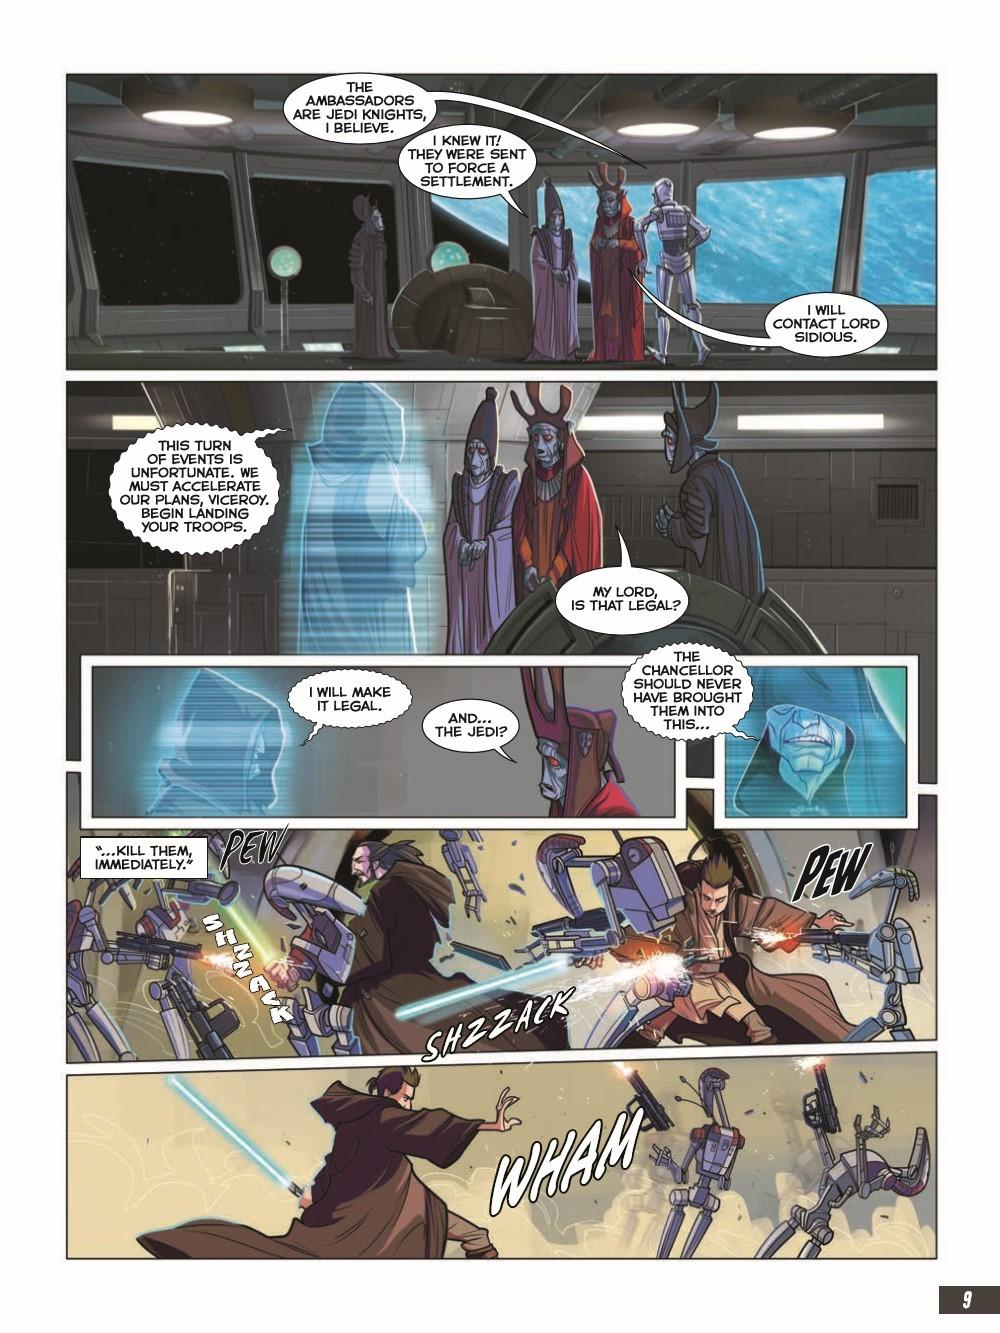 SW_The-Phantom-Menace_pr-5 ComicList Previews: STAR WARS THE PHANTOM MENACE GRAPHIC NOVEL ADAPTATION GN